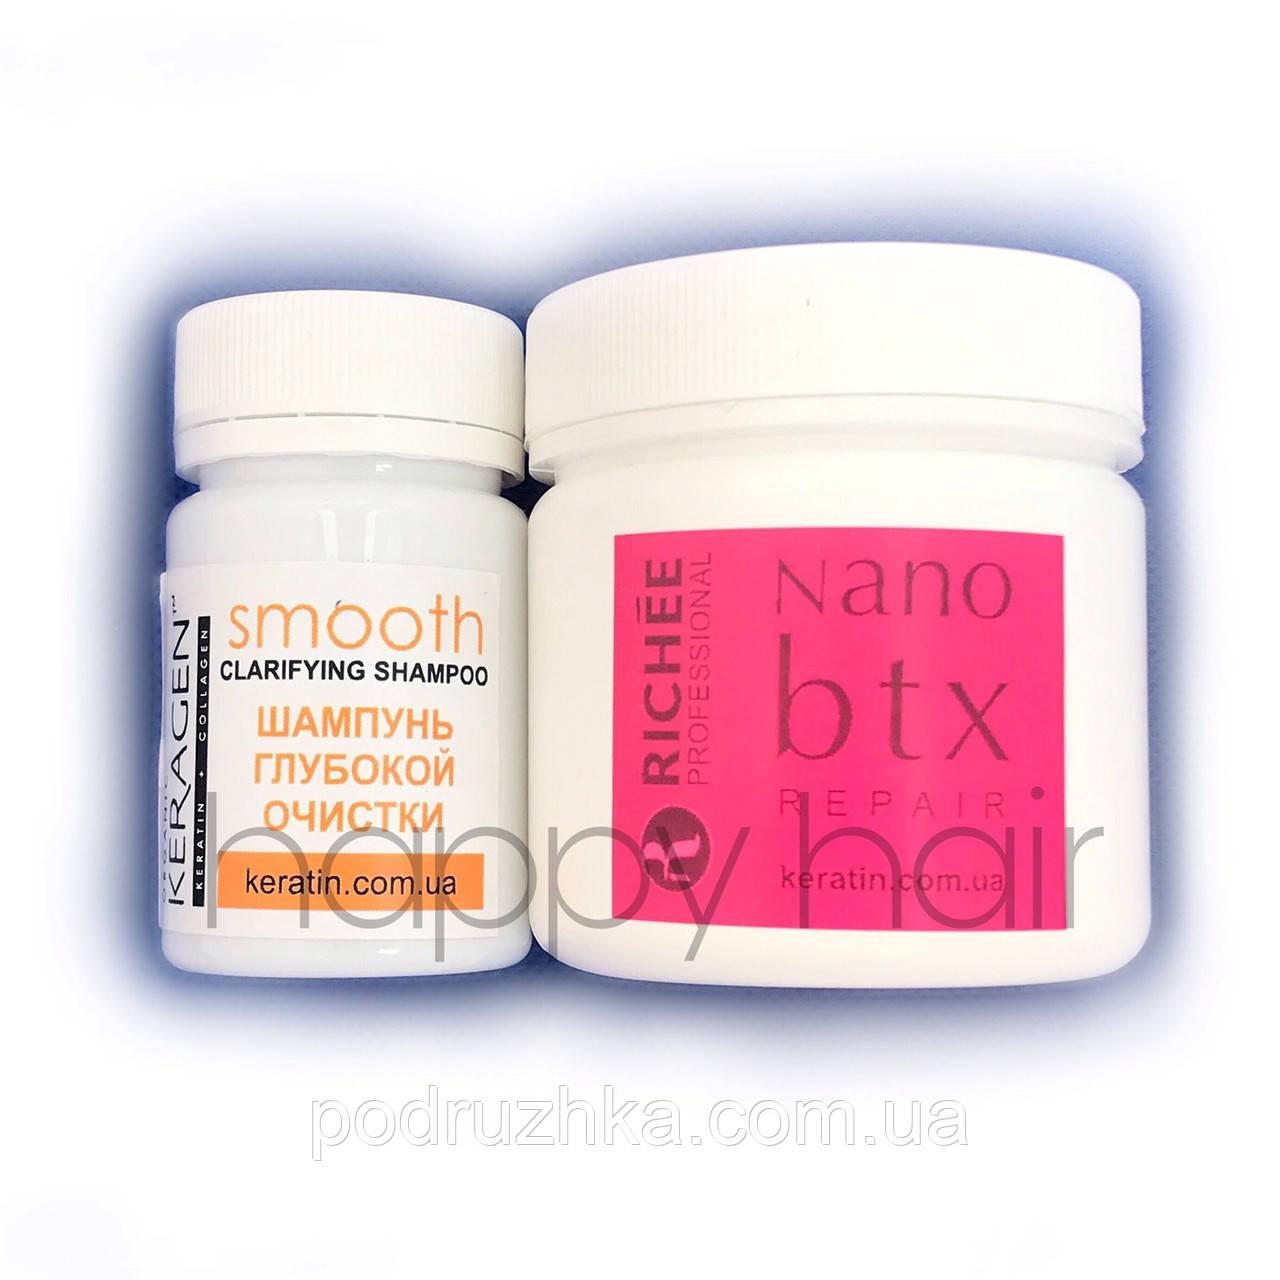 Richée Nano btox Repair Набор Наноботекс для волос 100/200 г